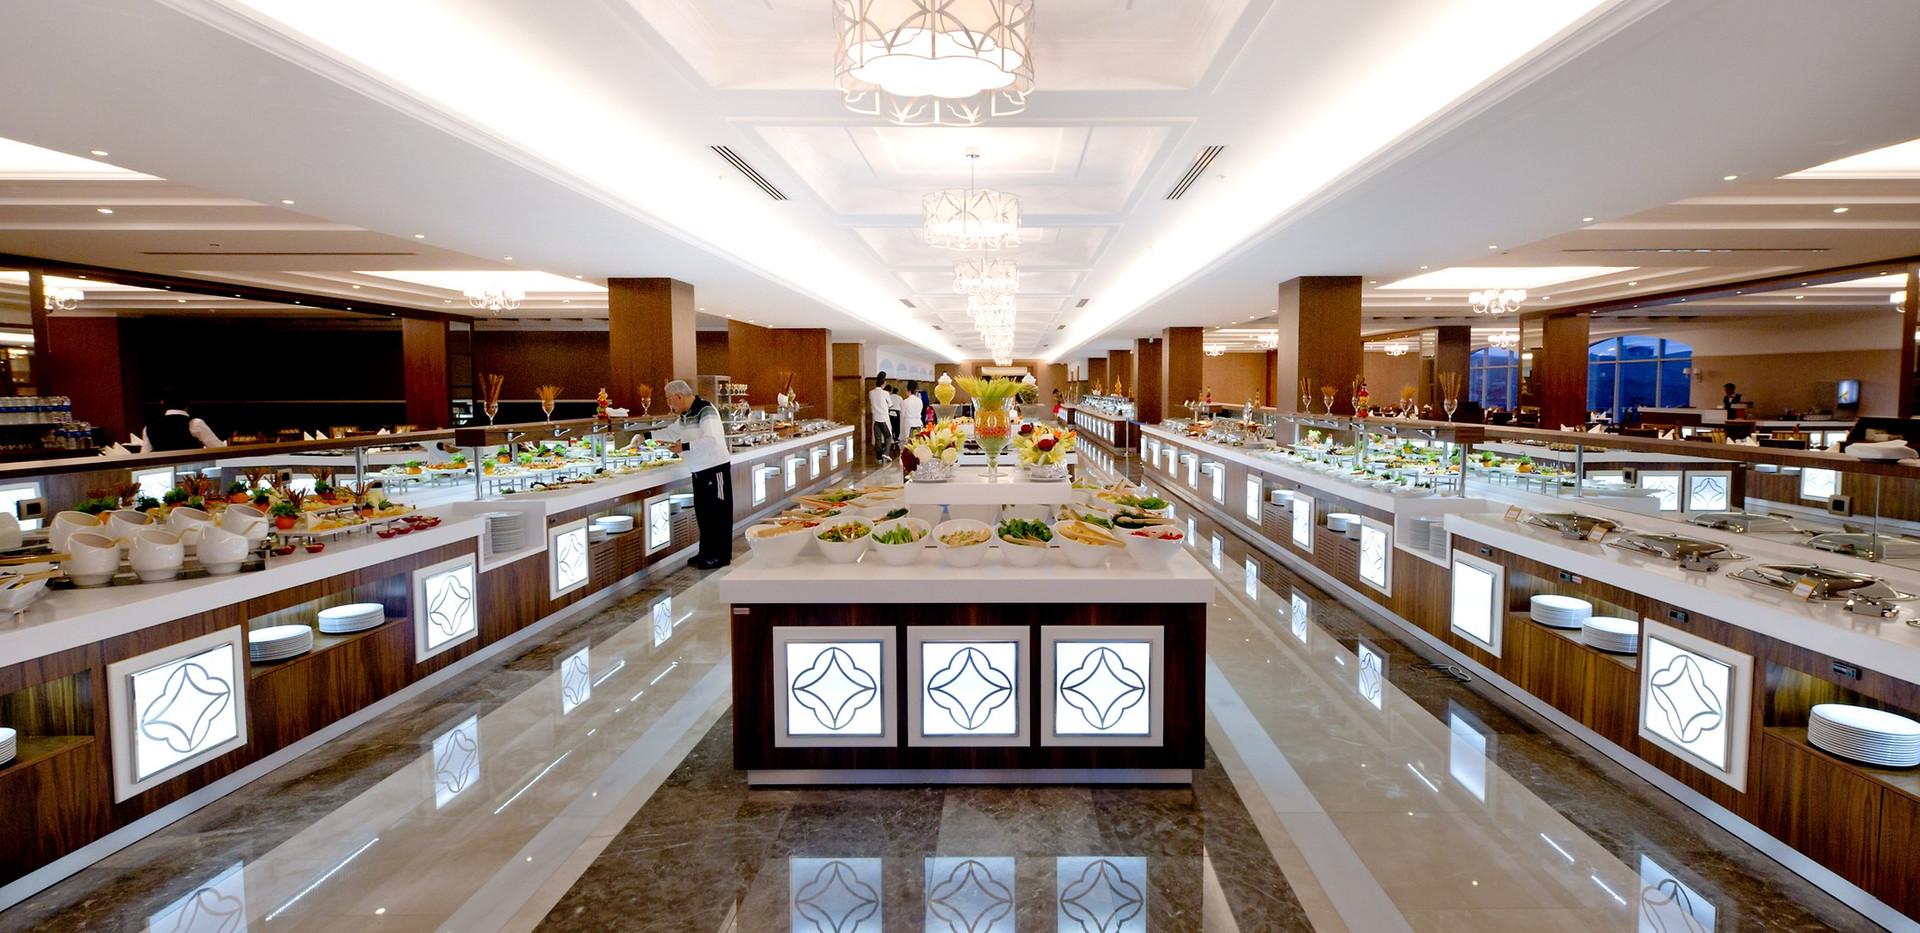 Nil-Luxury-Thermal-Hotel---Spa-Yeme-Icme